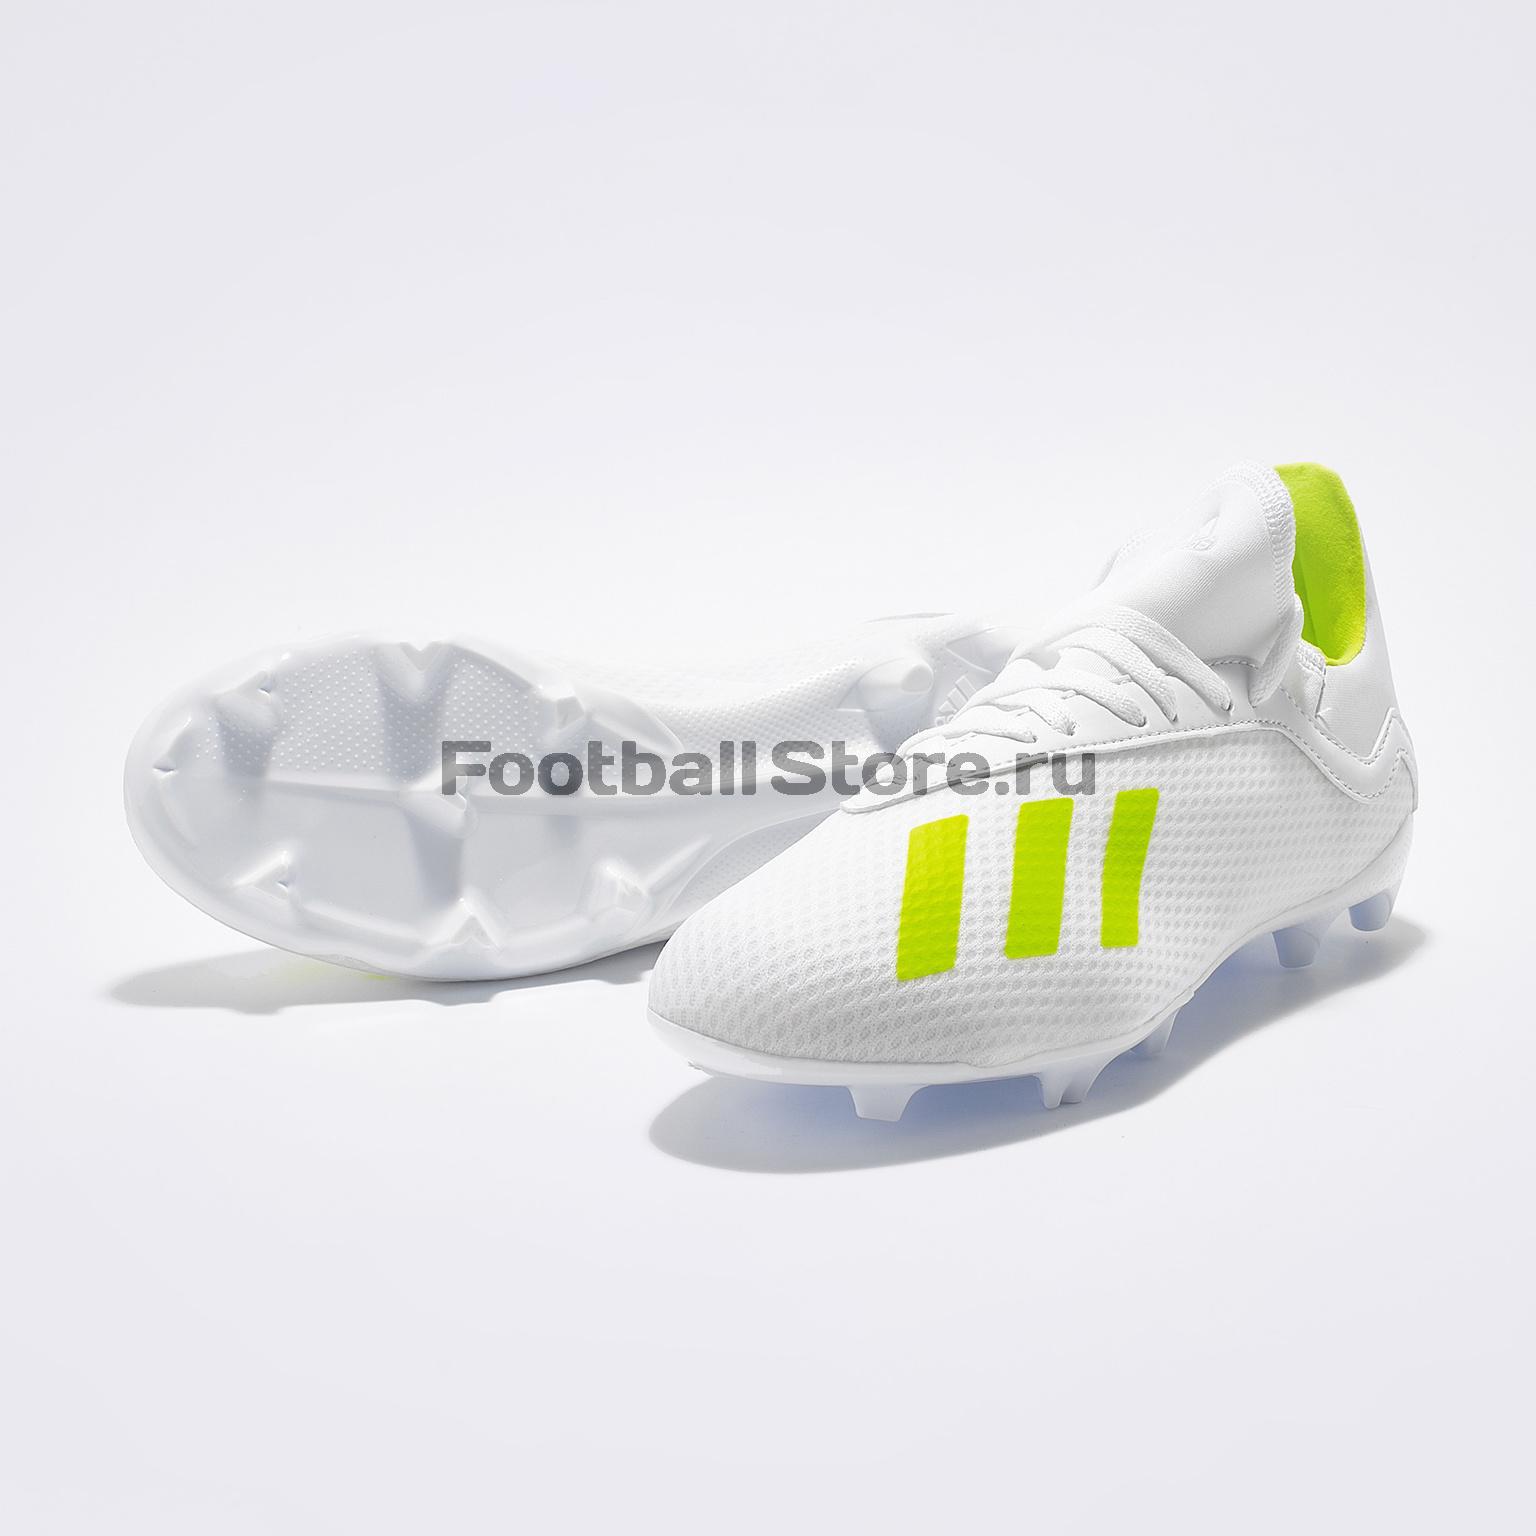 Бутсы детские Adidas X 18.3 FG BB9372 бутсы adidas x 17 1 fg bb6353